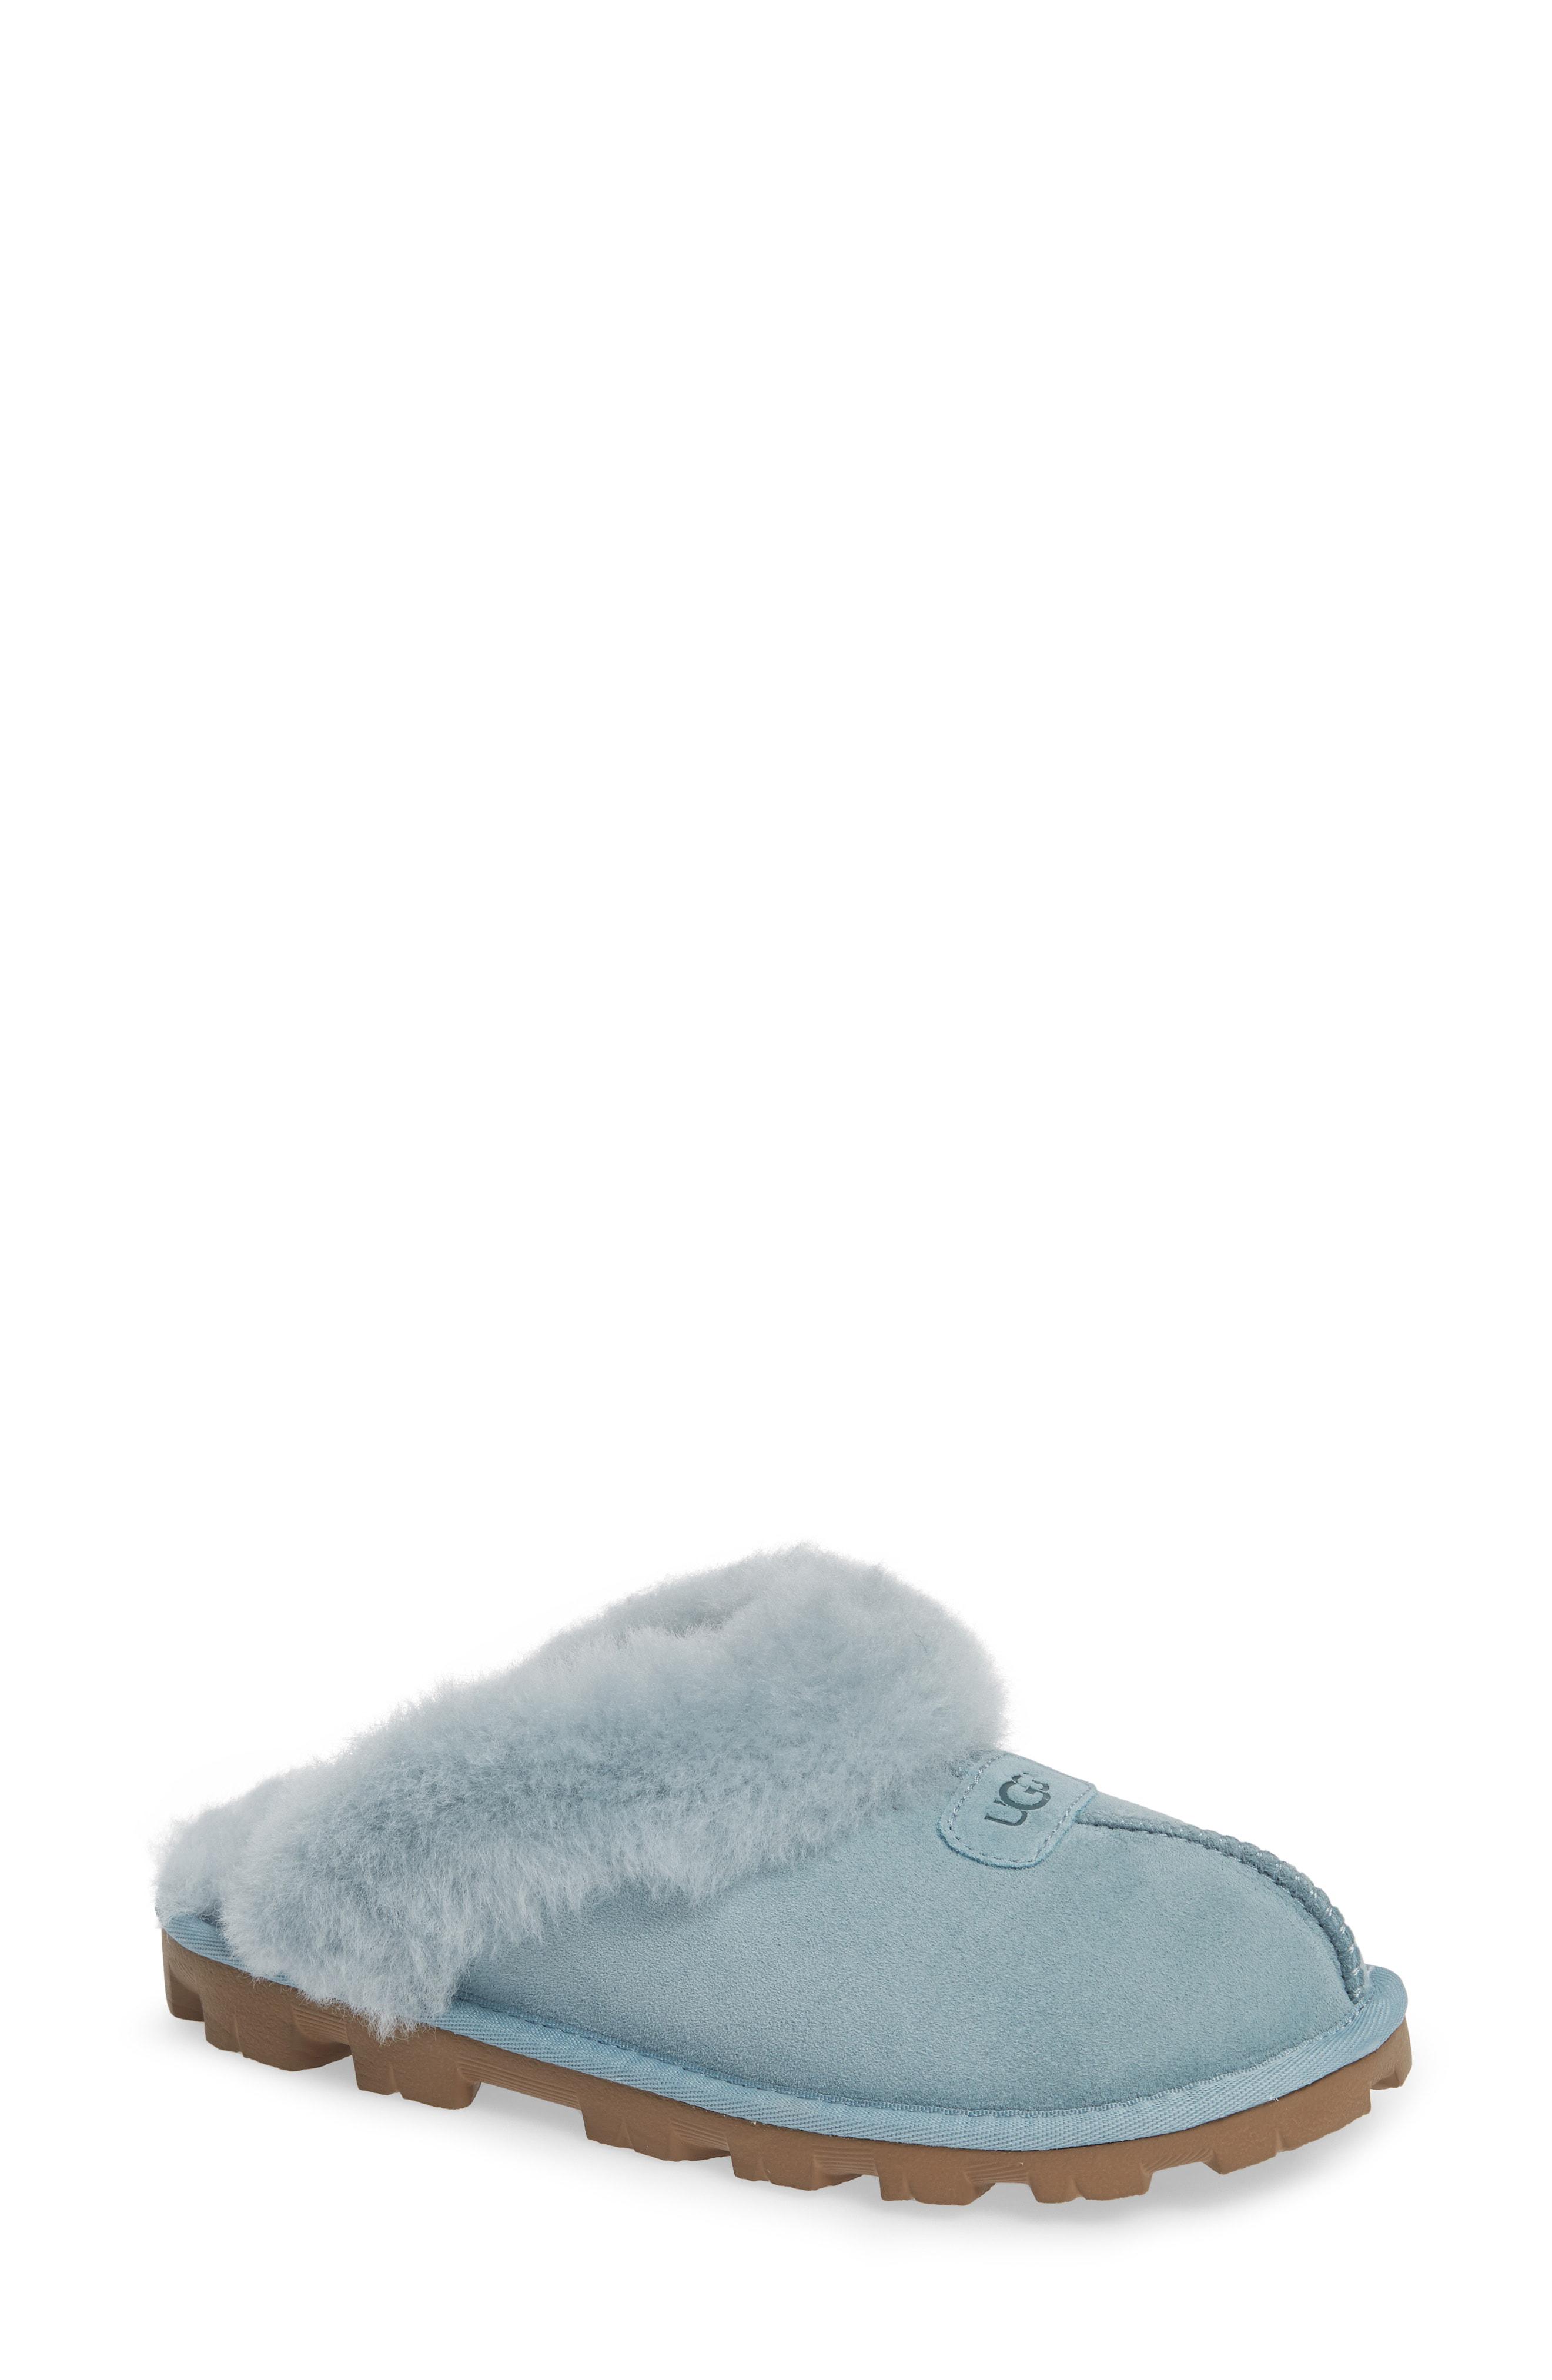 6e3b0e409 Ugg Genuine Shearling Slipper In Succulent | ModeSens